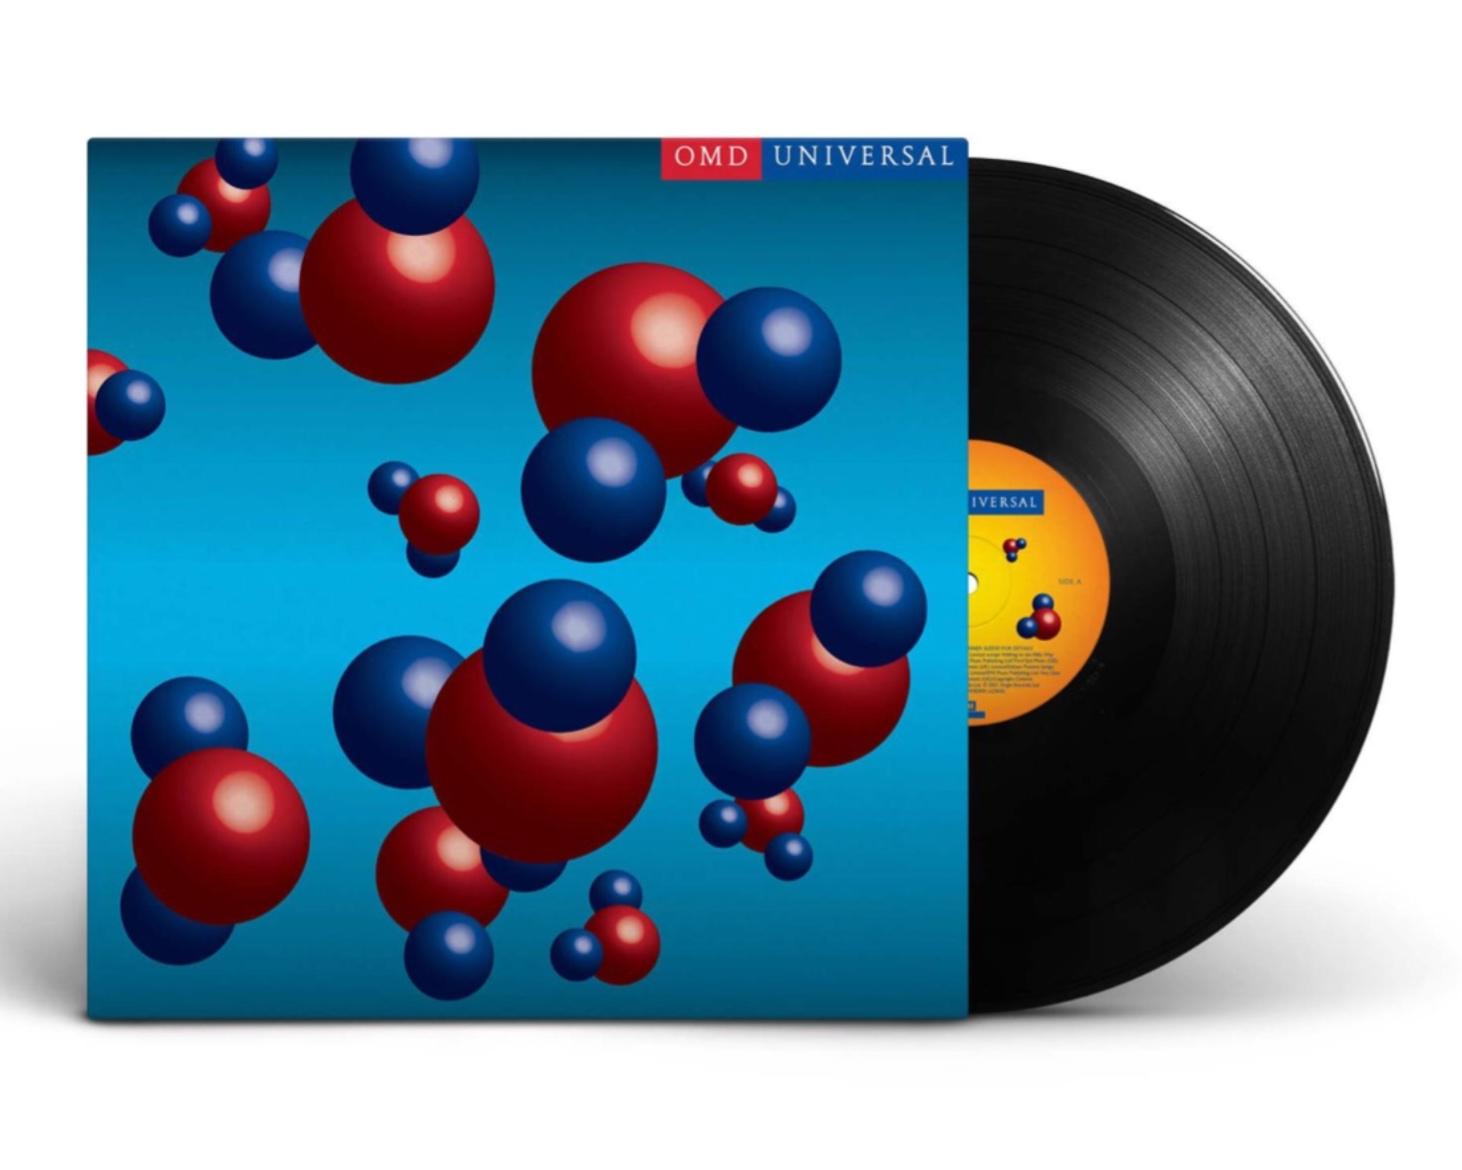 Image of the Universal Vinyl LP